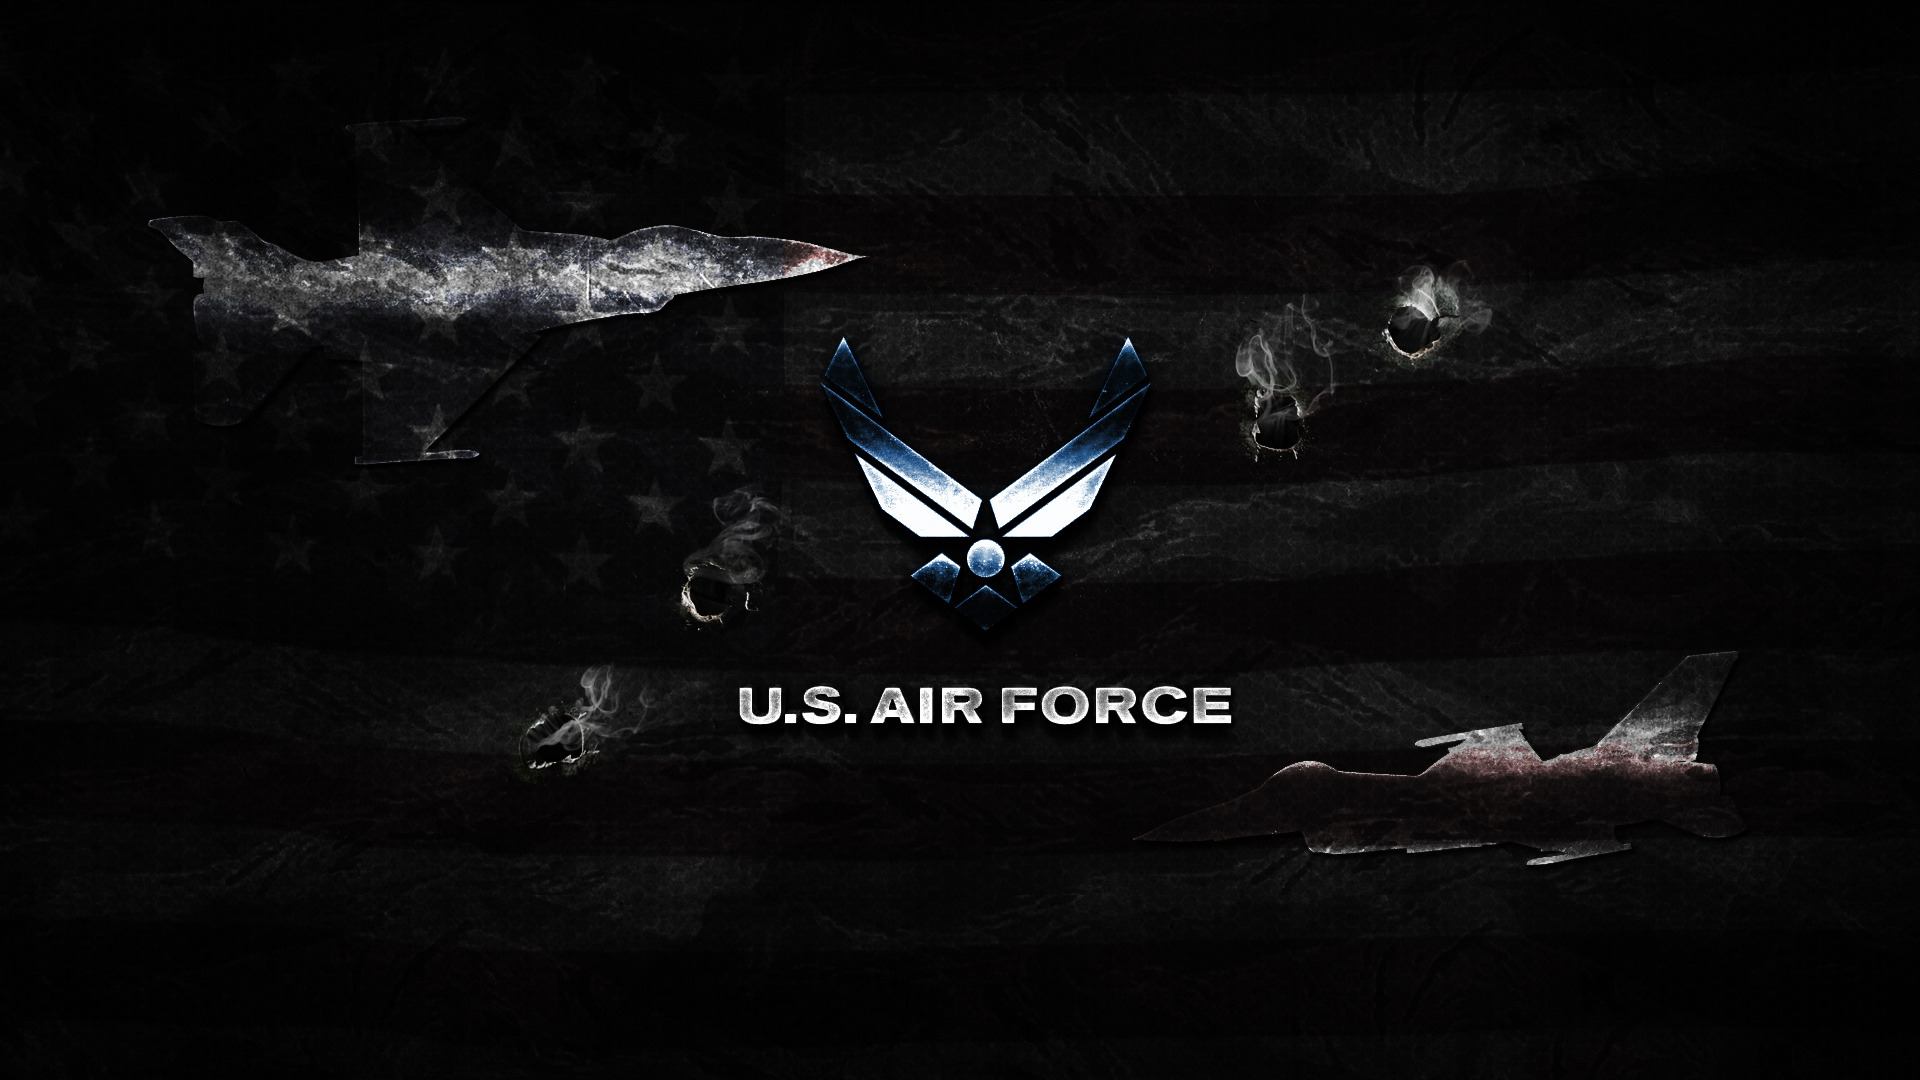 US Air Force logo wallpaper 19266 1920x1080